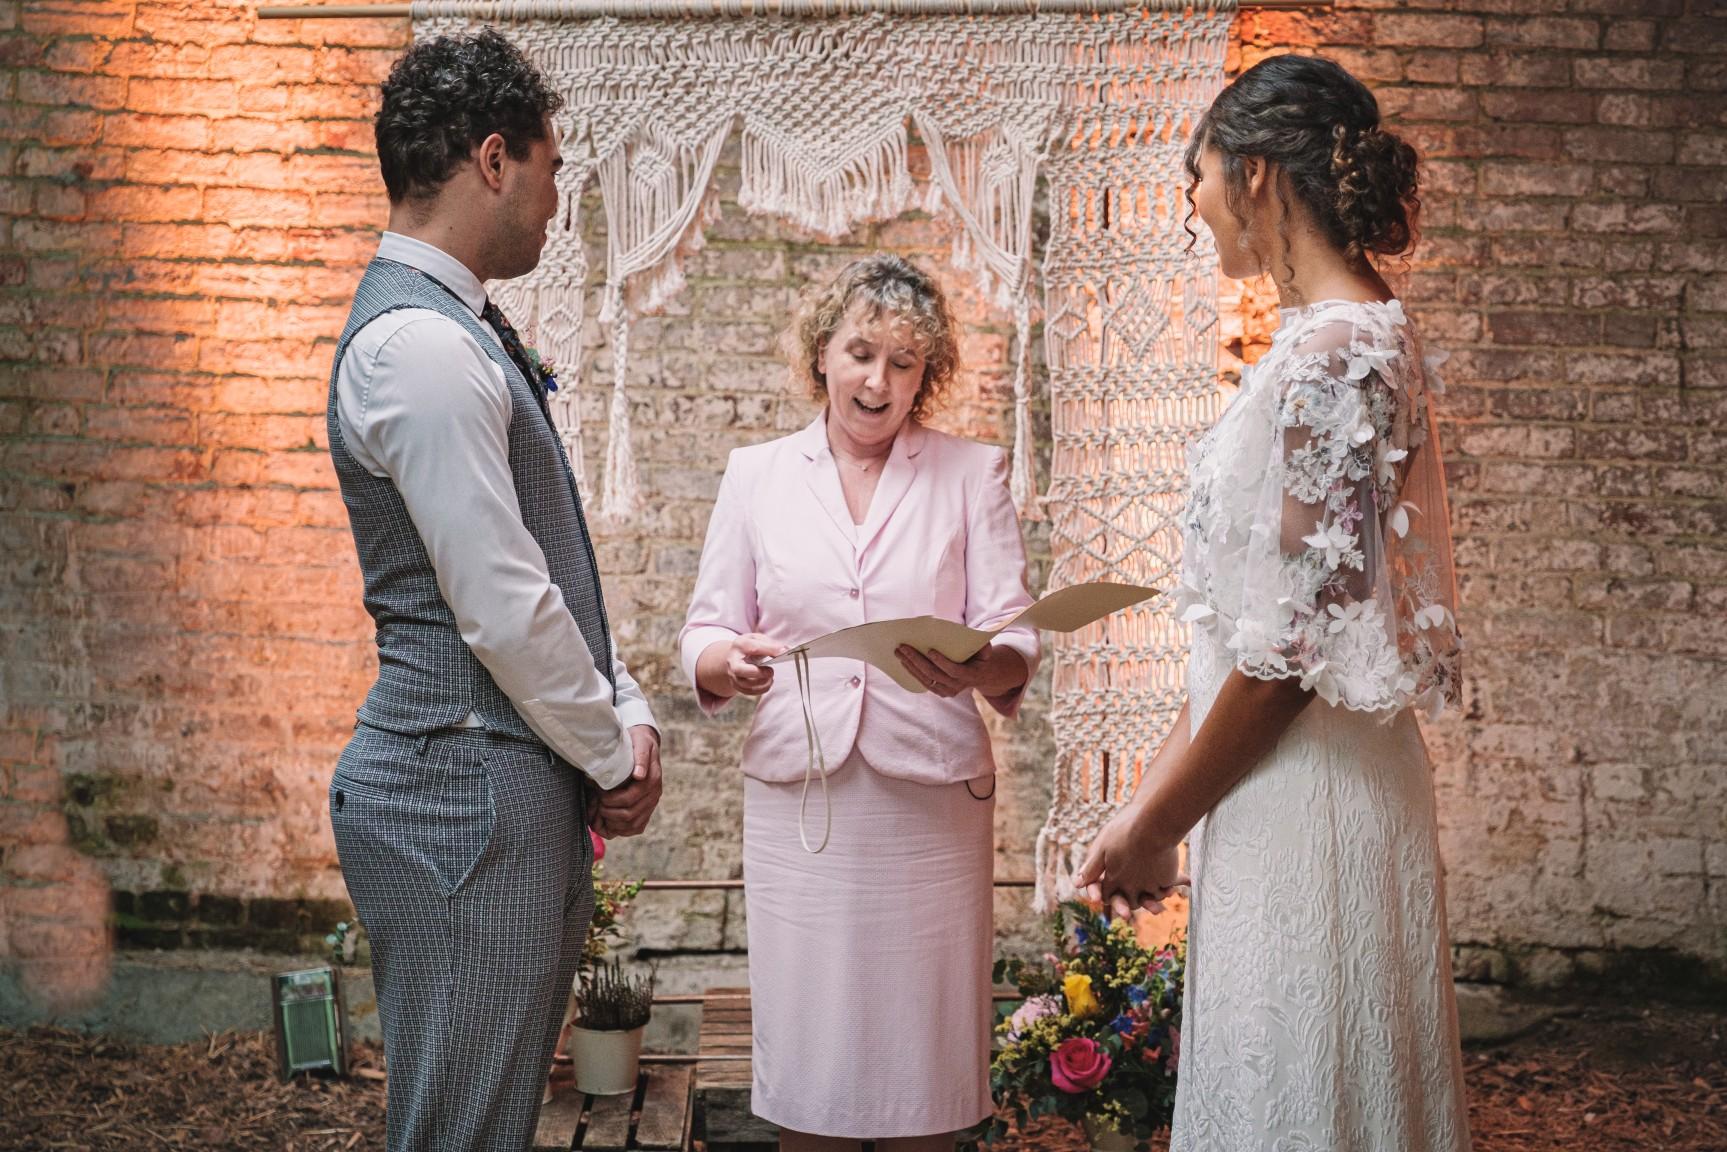 intimate wedding ceremony - bohemian wedding ceremony - celebrant wedding ceremony